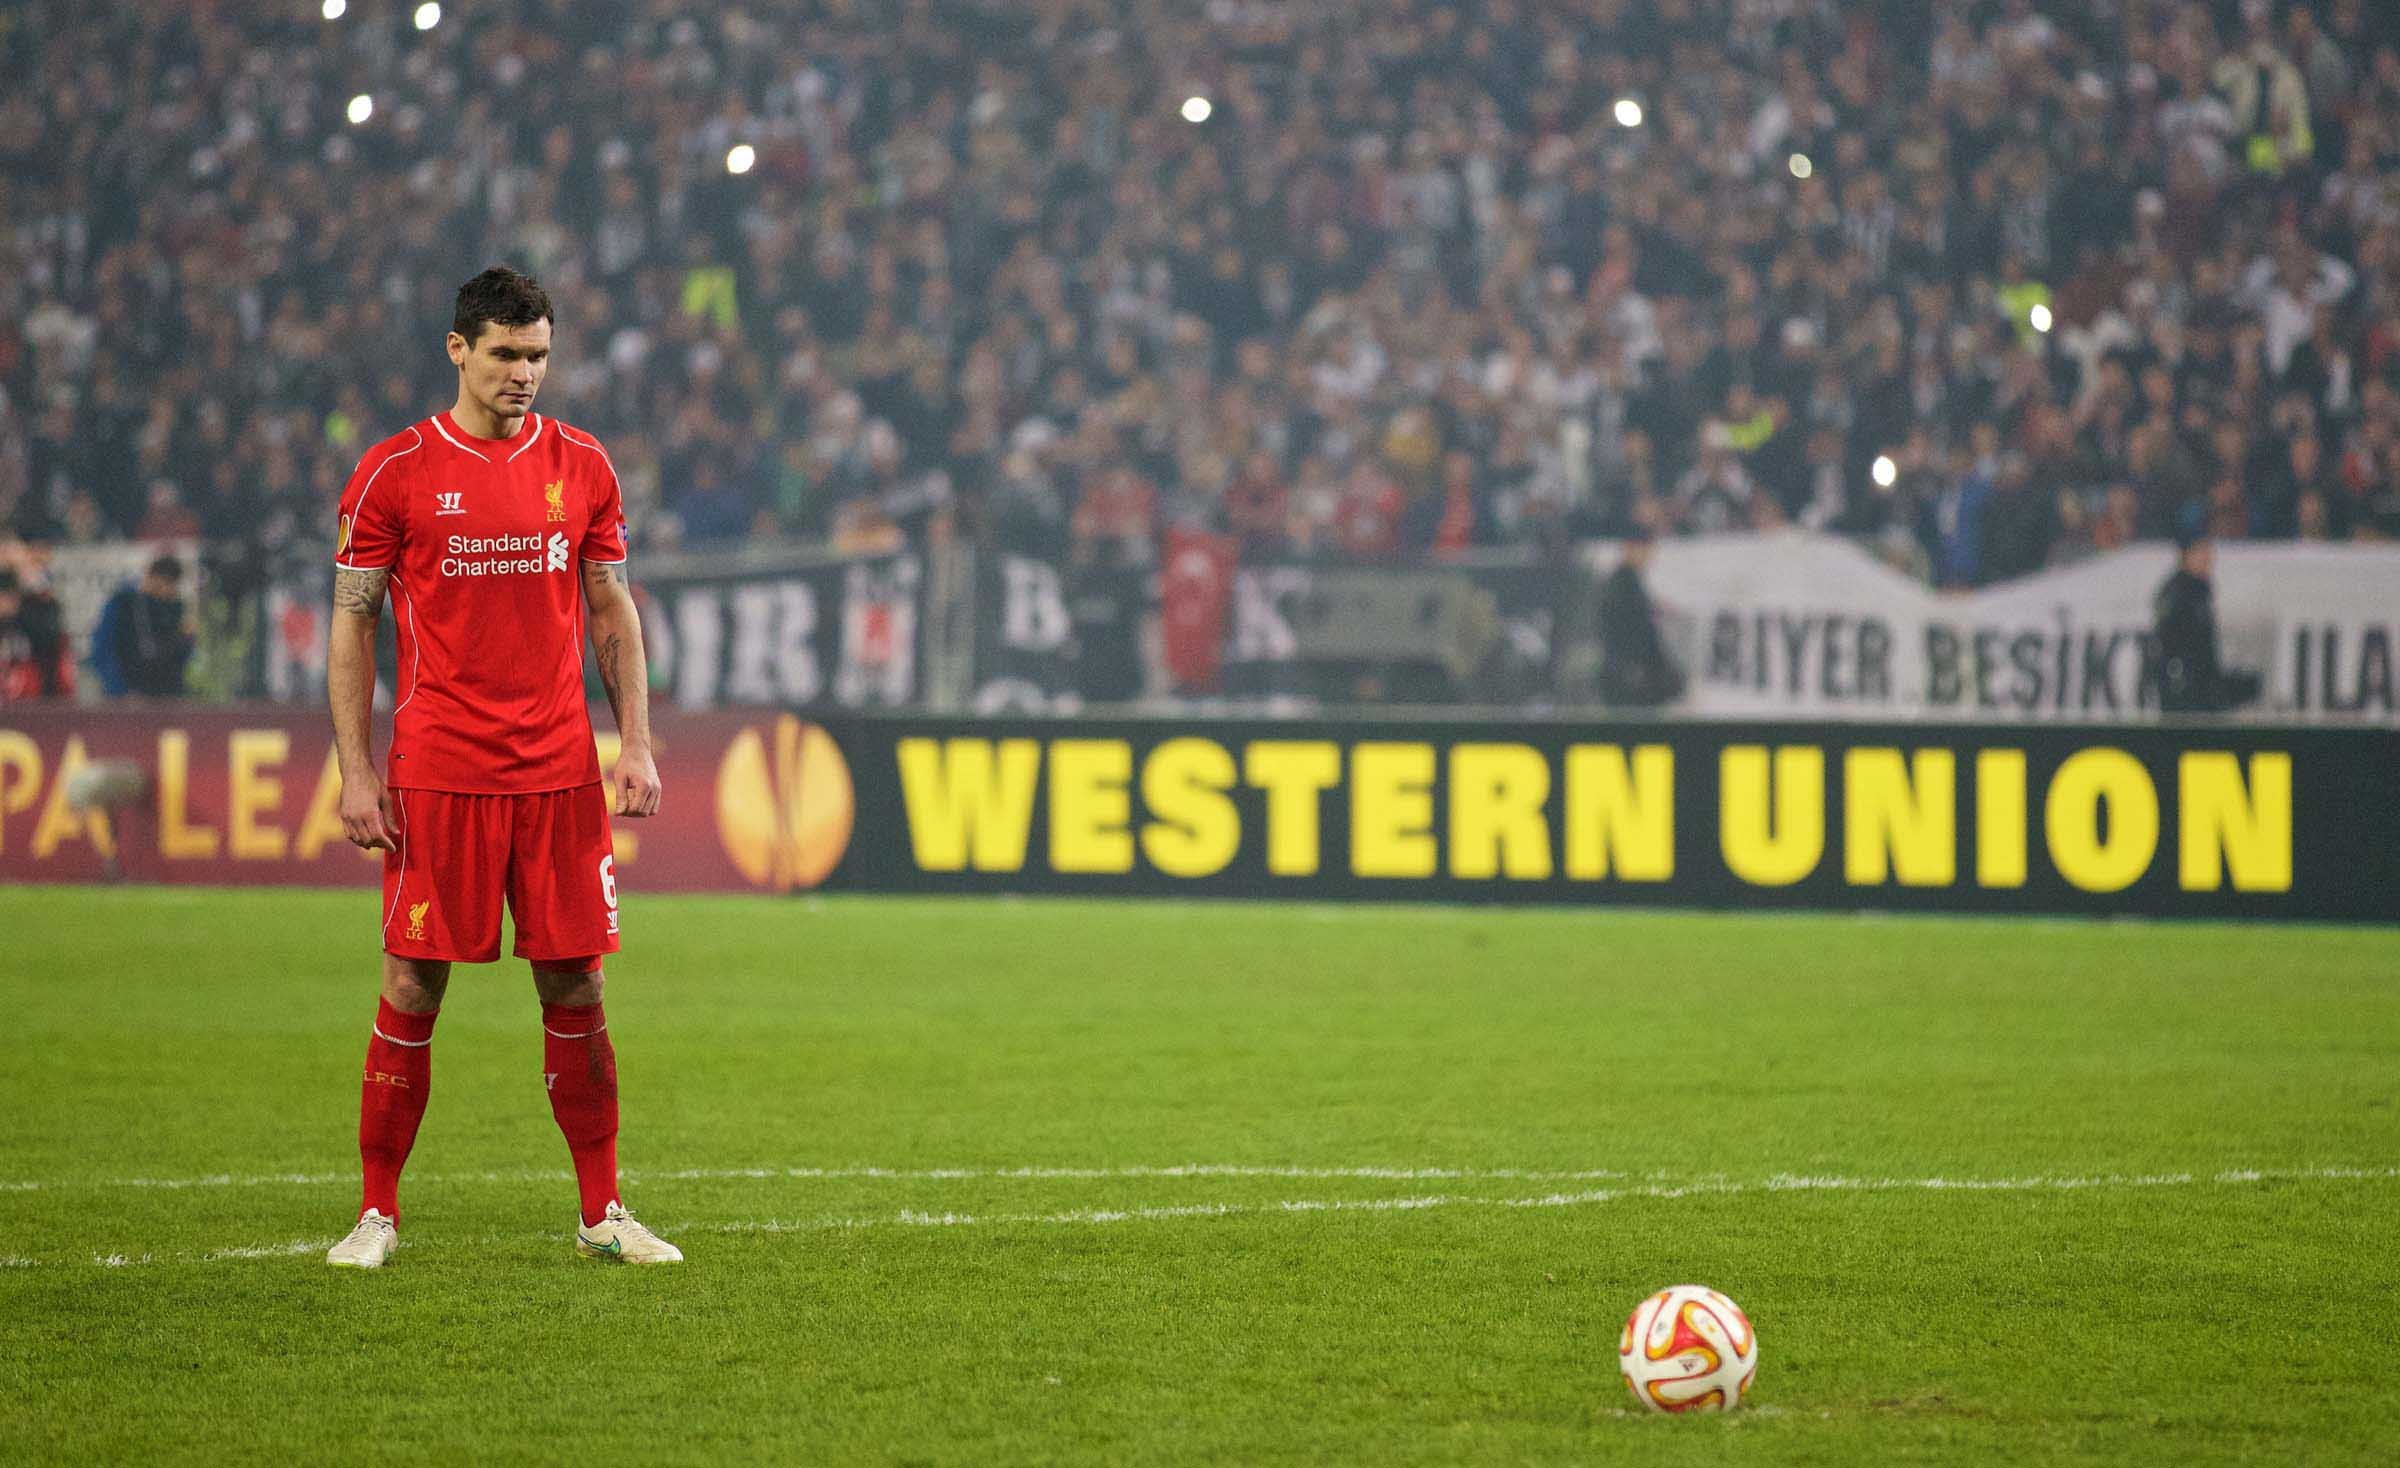 European Football - UEFA Europa League - Round of 32 2nd Leg - Besiktas JK v Liverpool FC